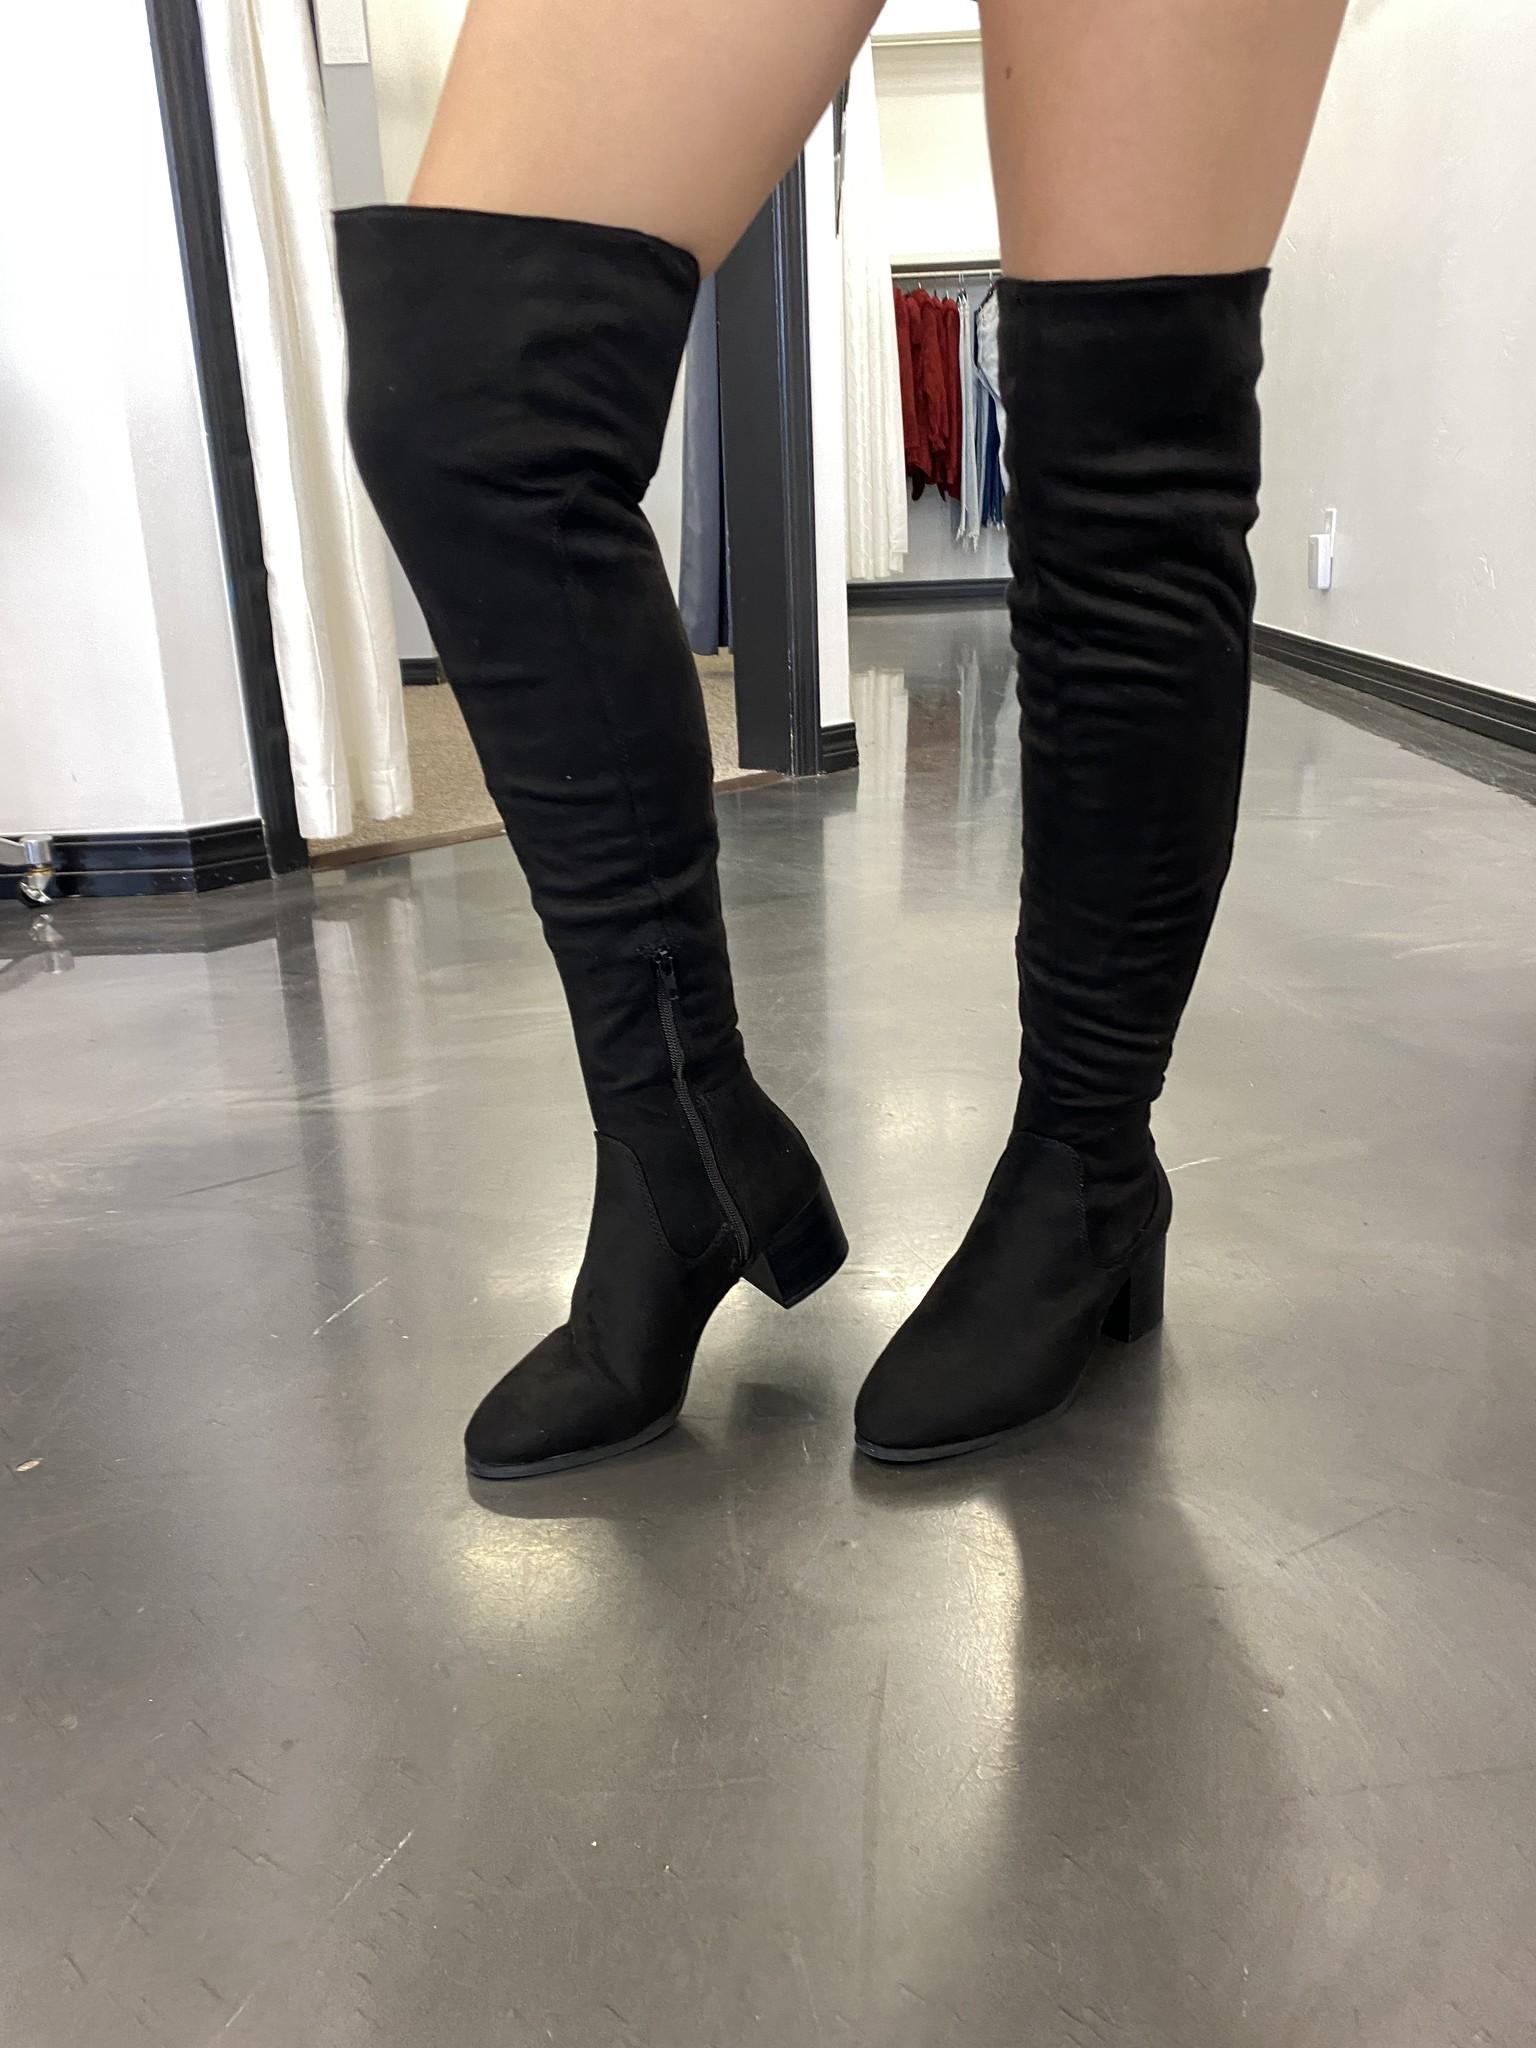 Kat Black Knee High Boots